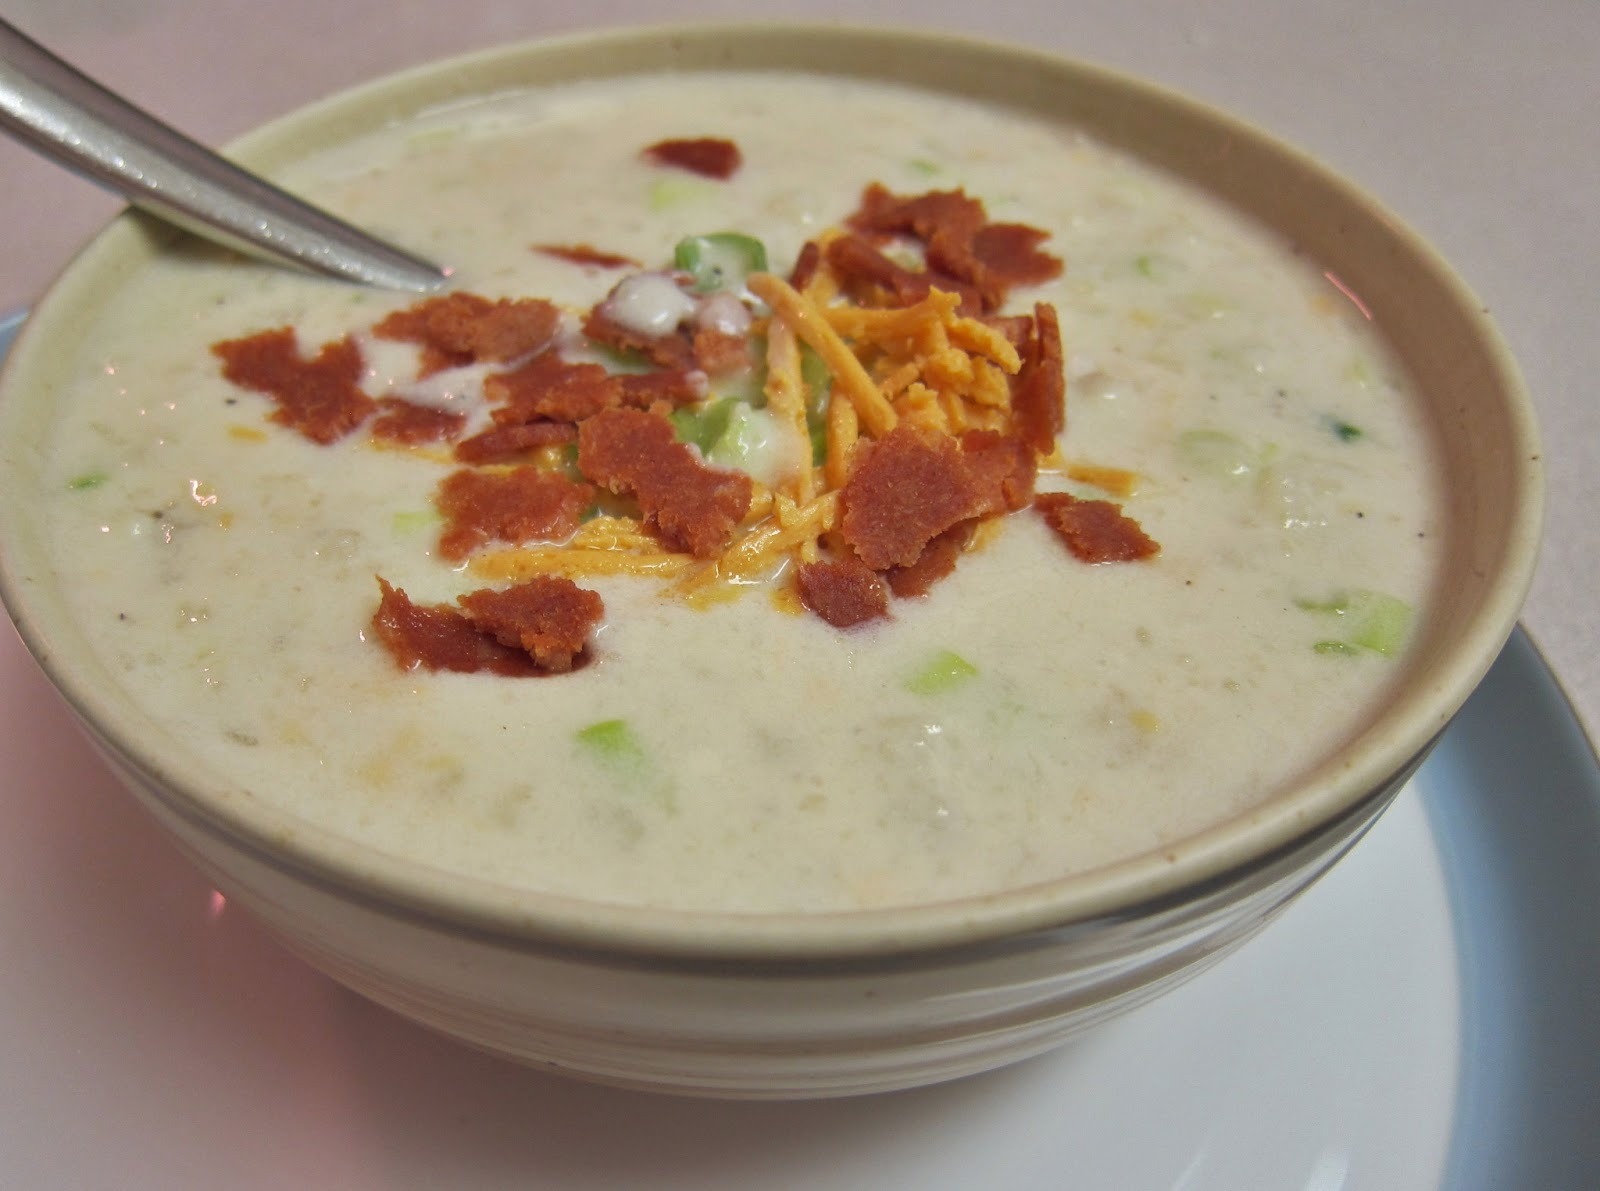 The Vegan Chronicle: Baked Potato Soup